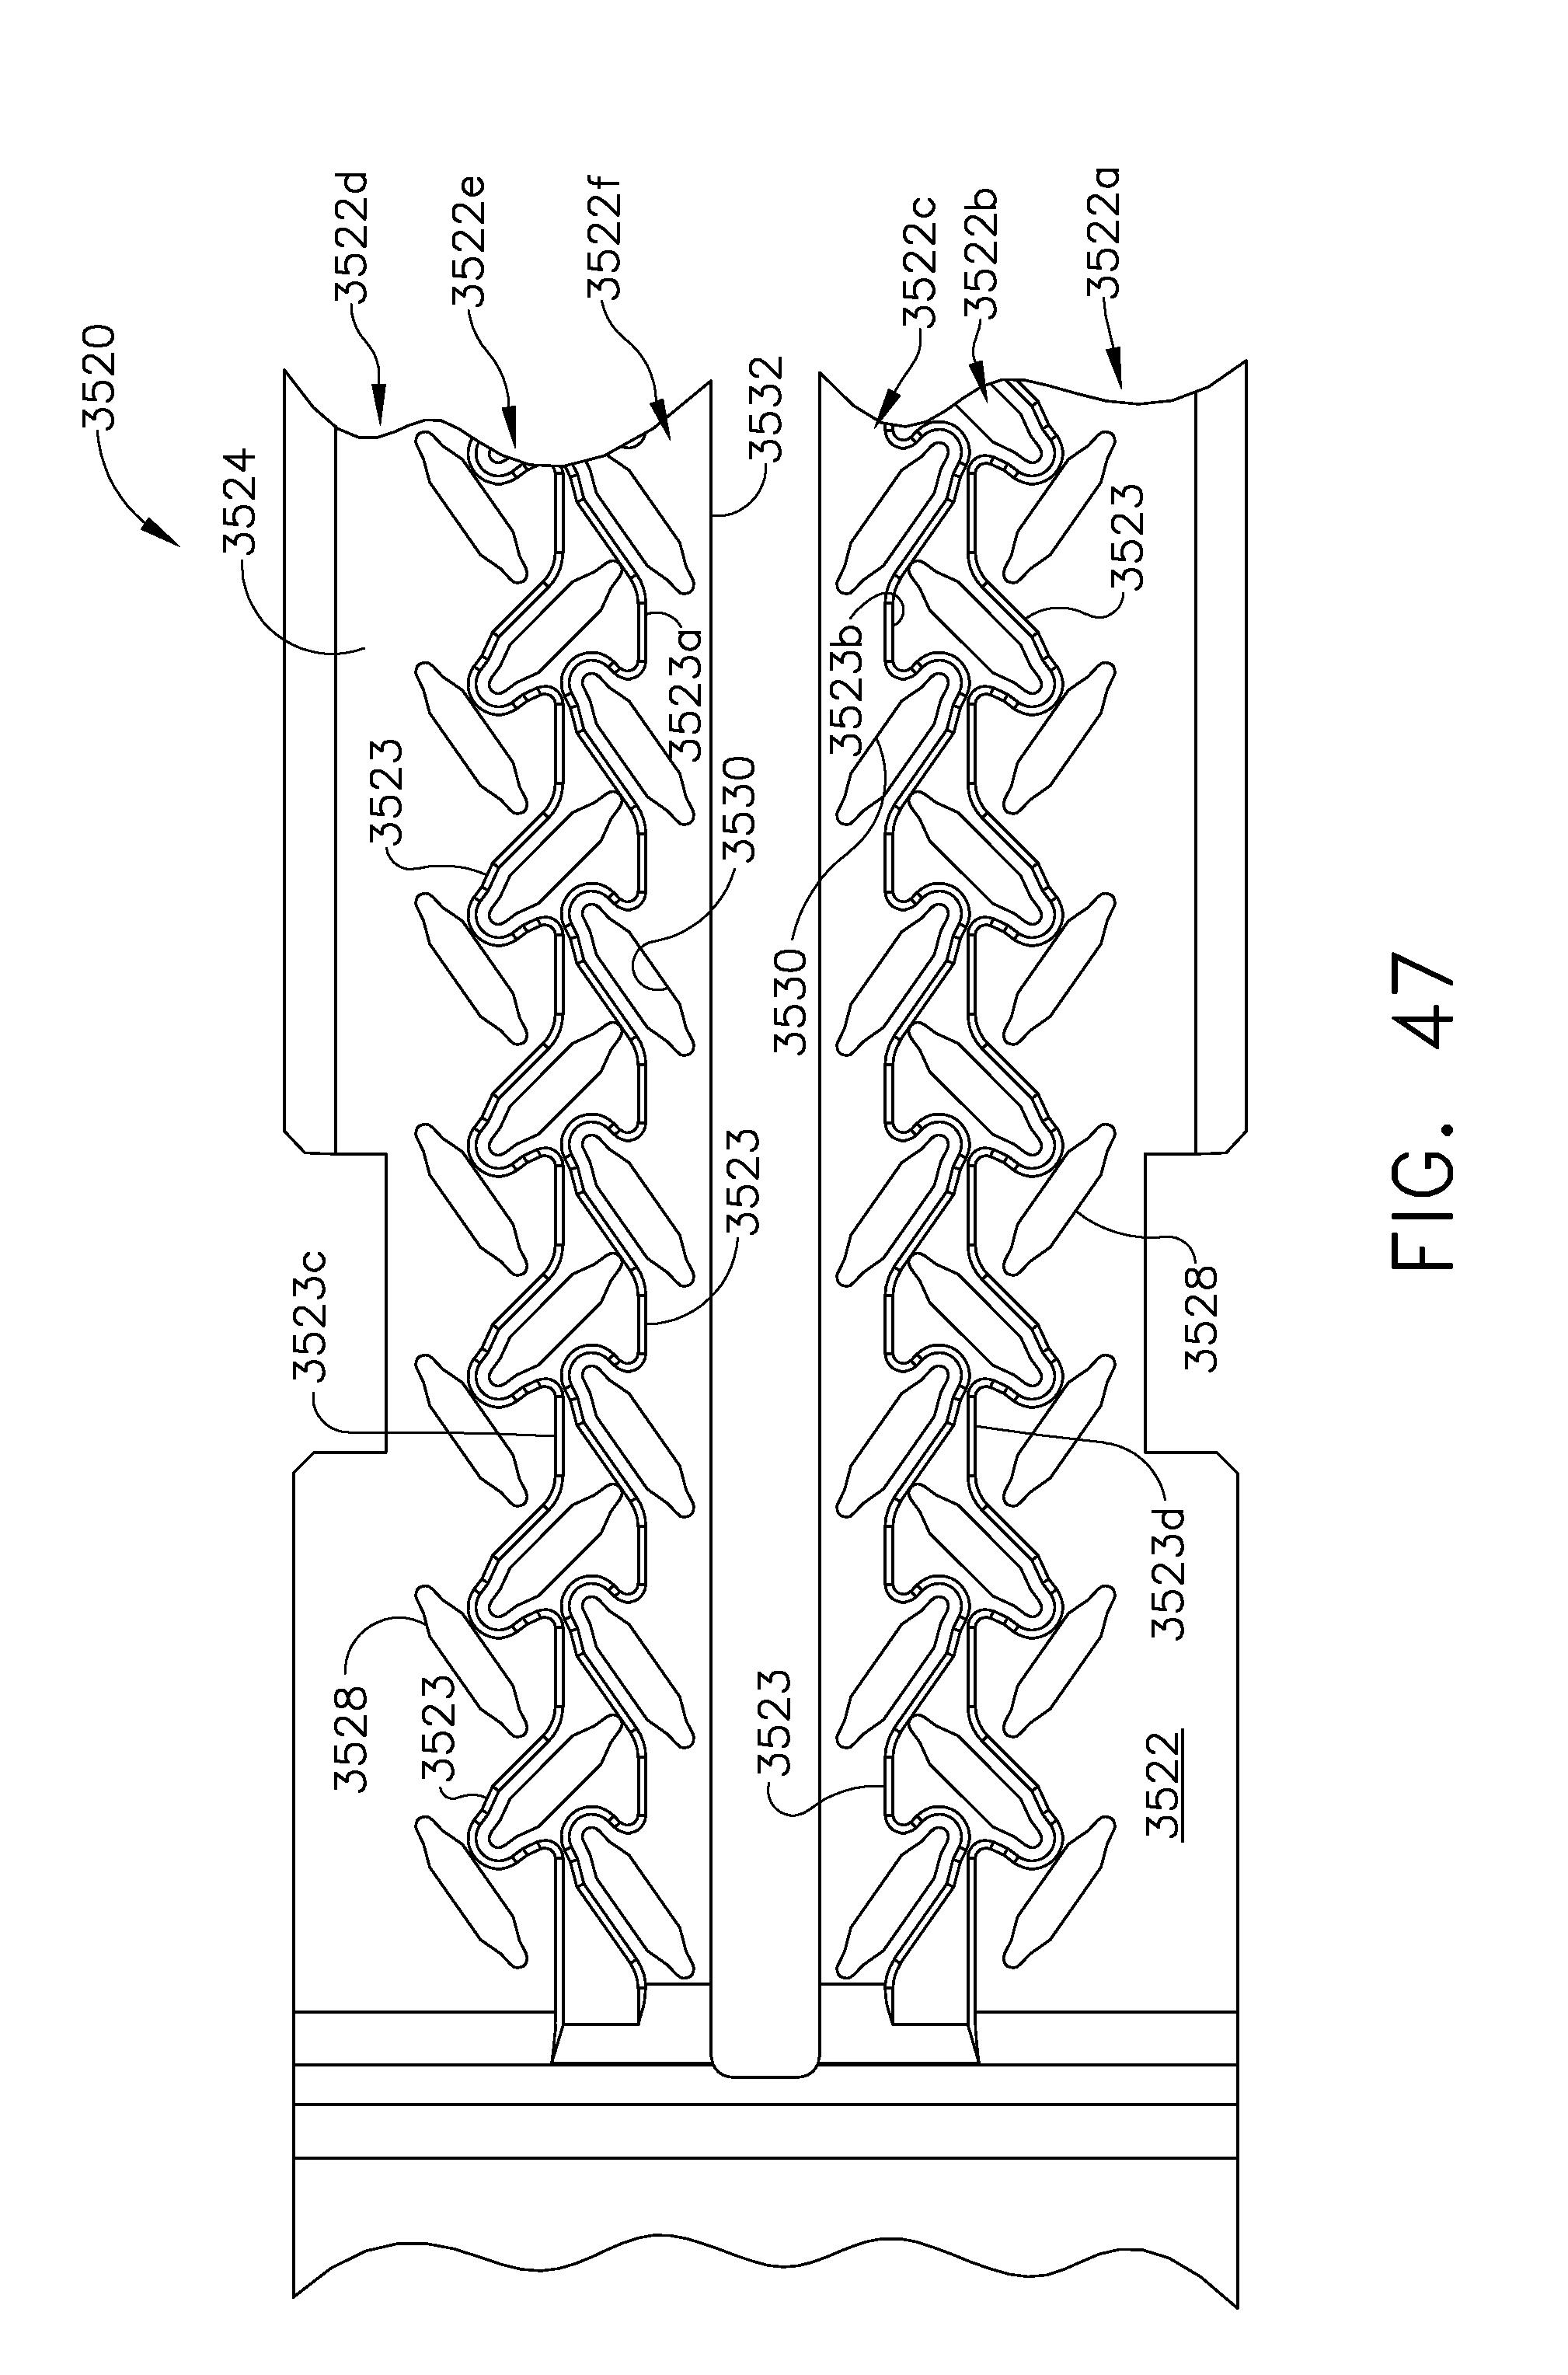 Logitech Z4 Wiring Diagram Auto Electrical